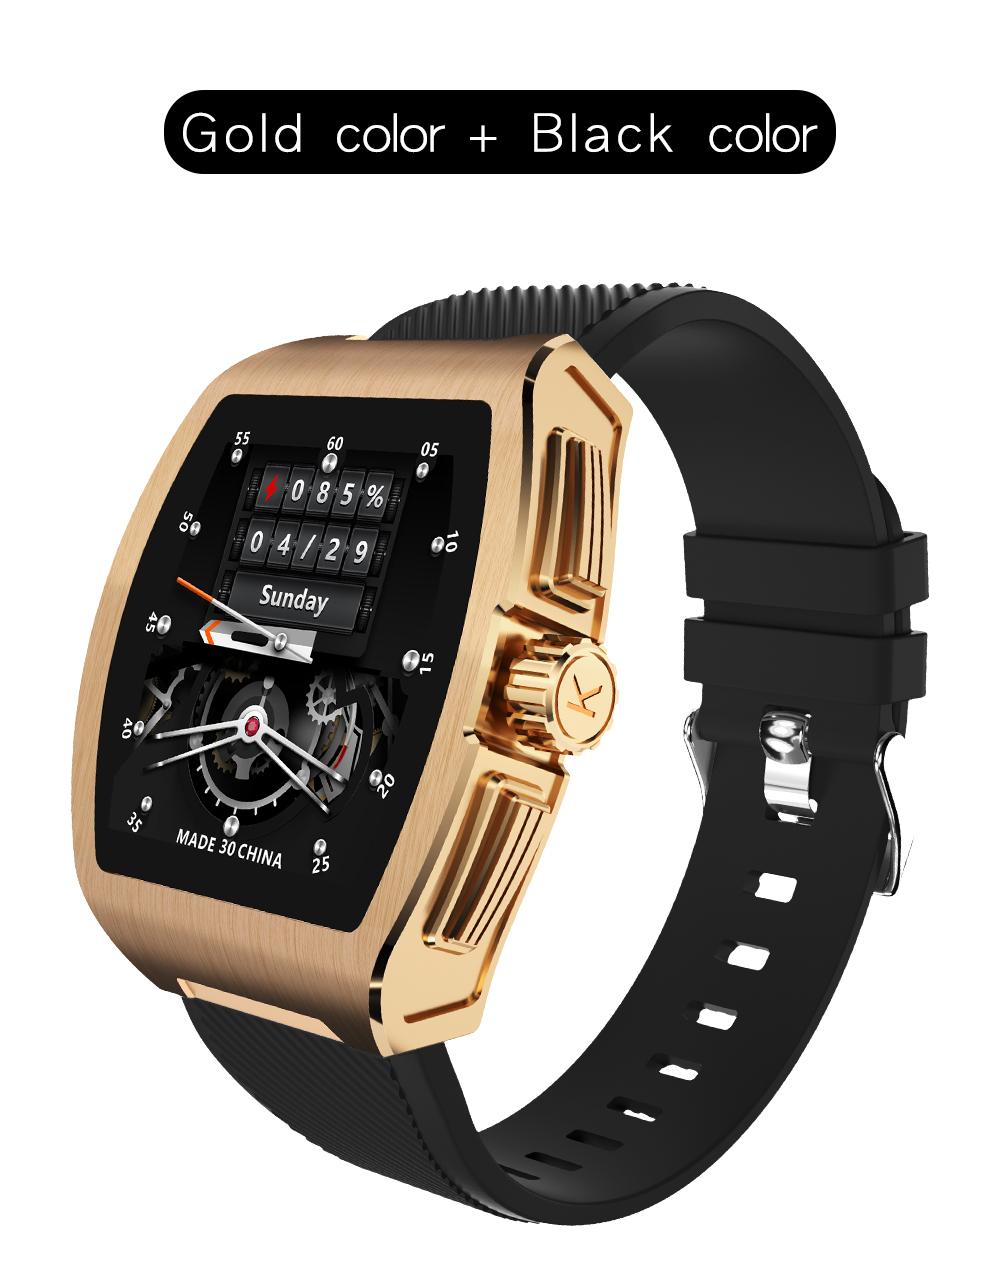 C1 Smart Bracelet Temperature Monitor Bluetooth Heart Rate Blood Pressure Smart Watche Golden